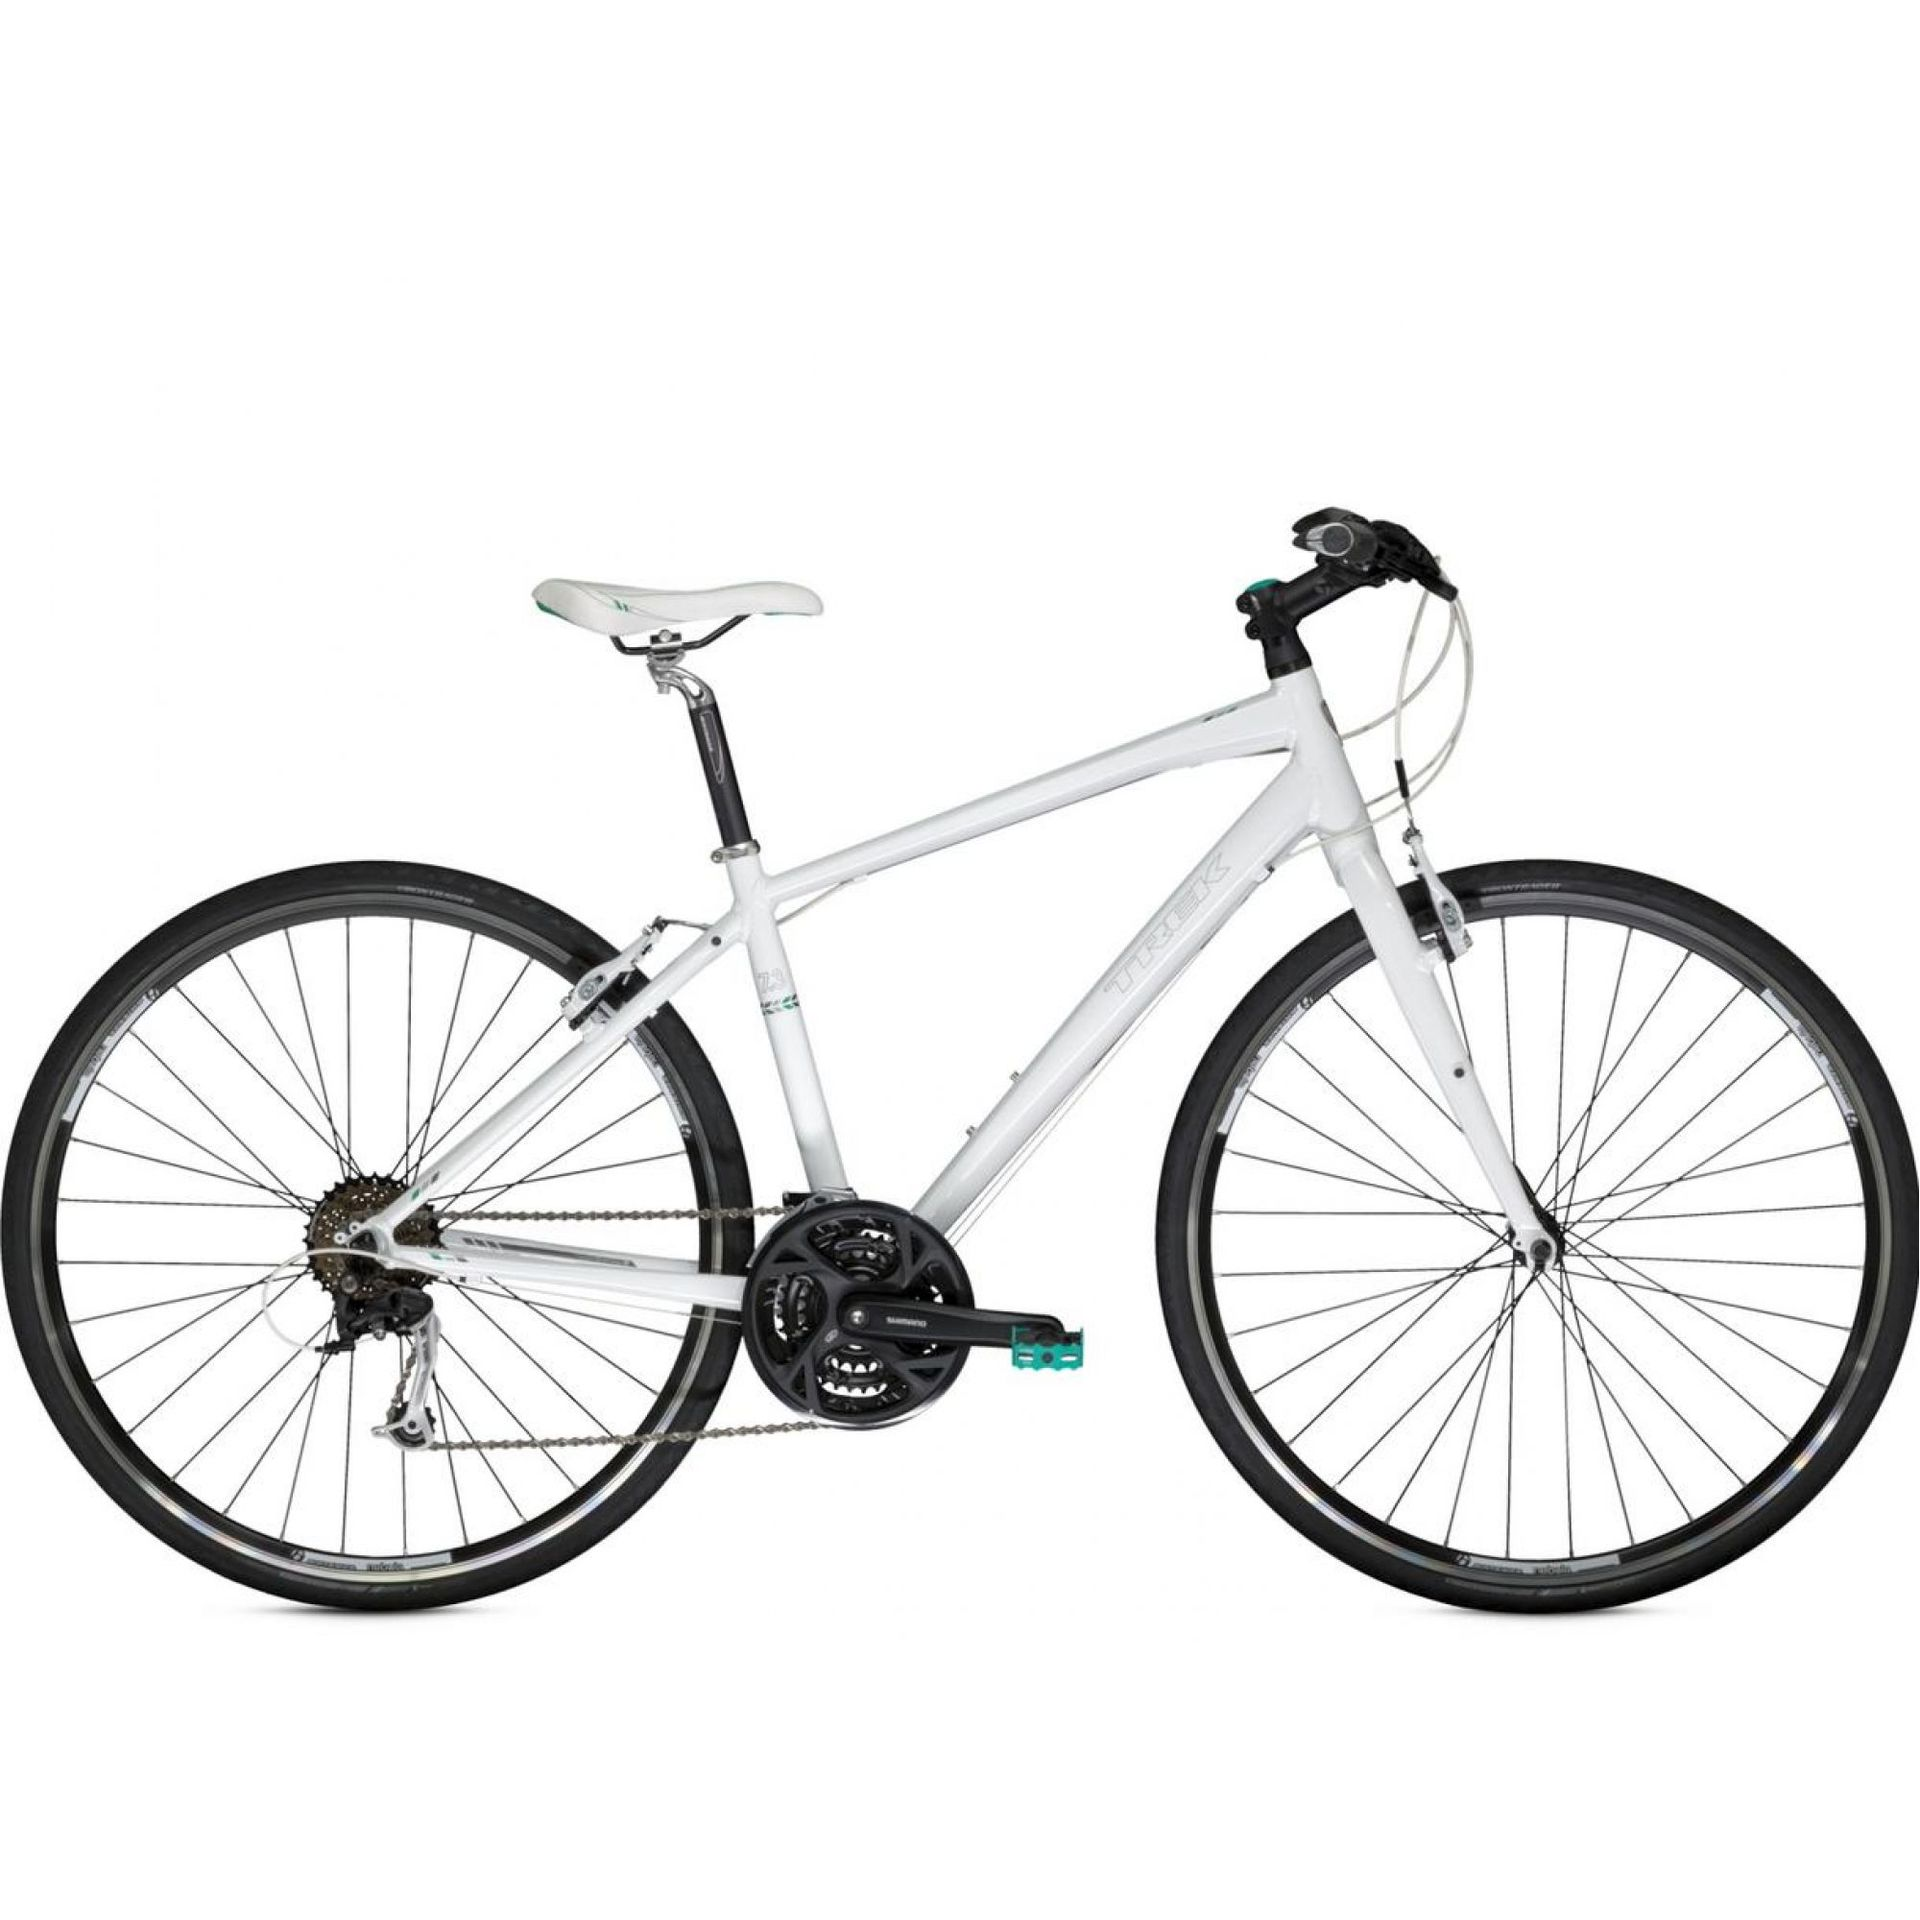 Rower Trek 7.2 FX Biały